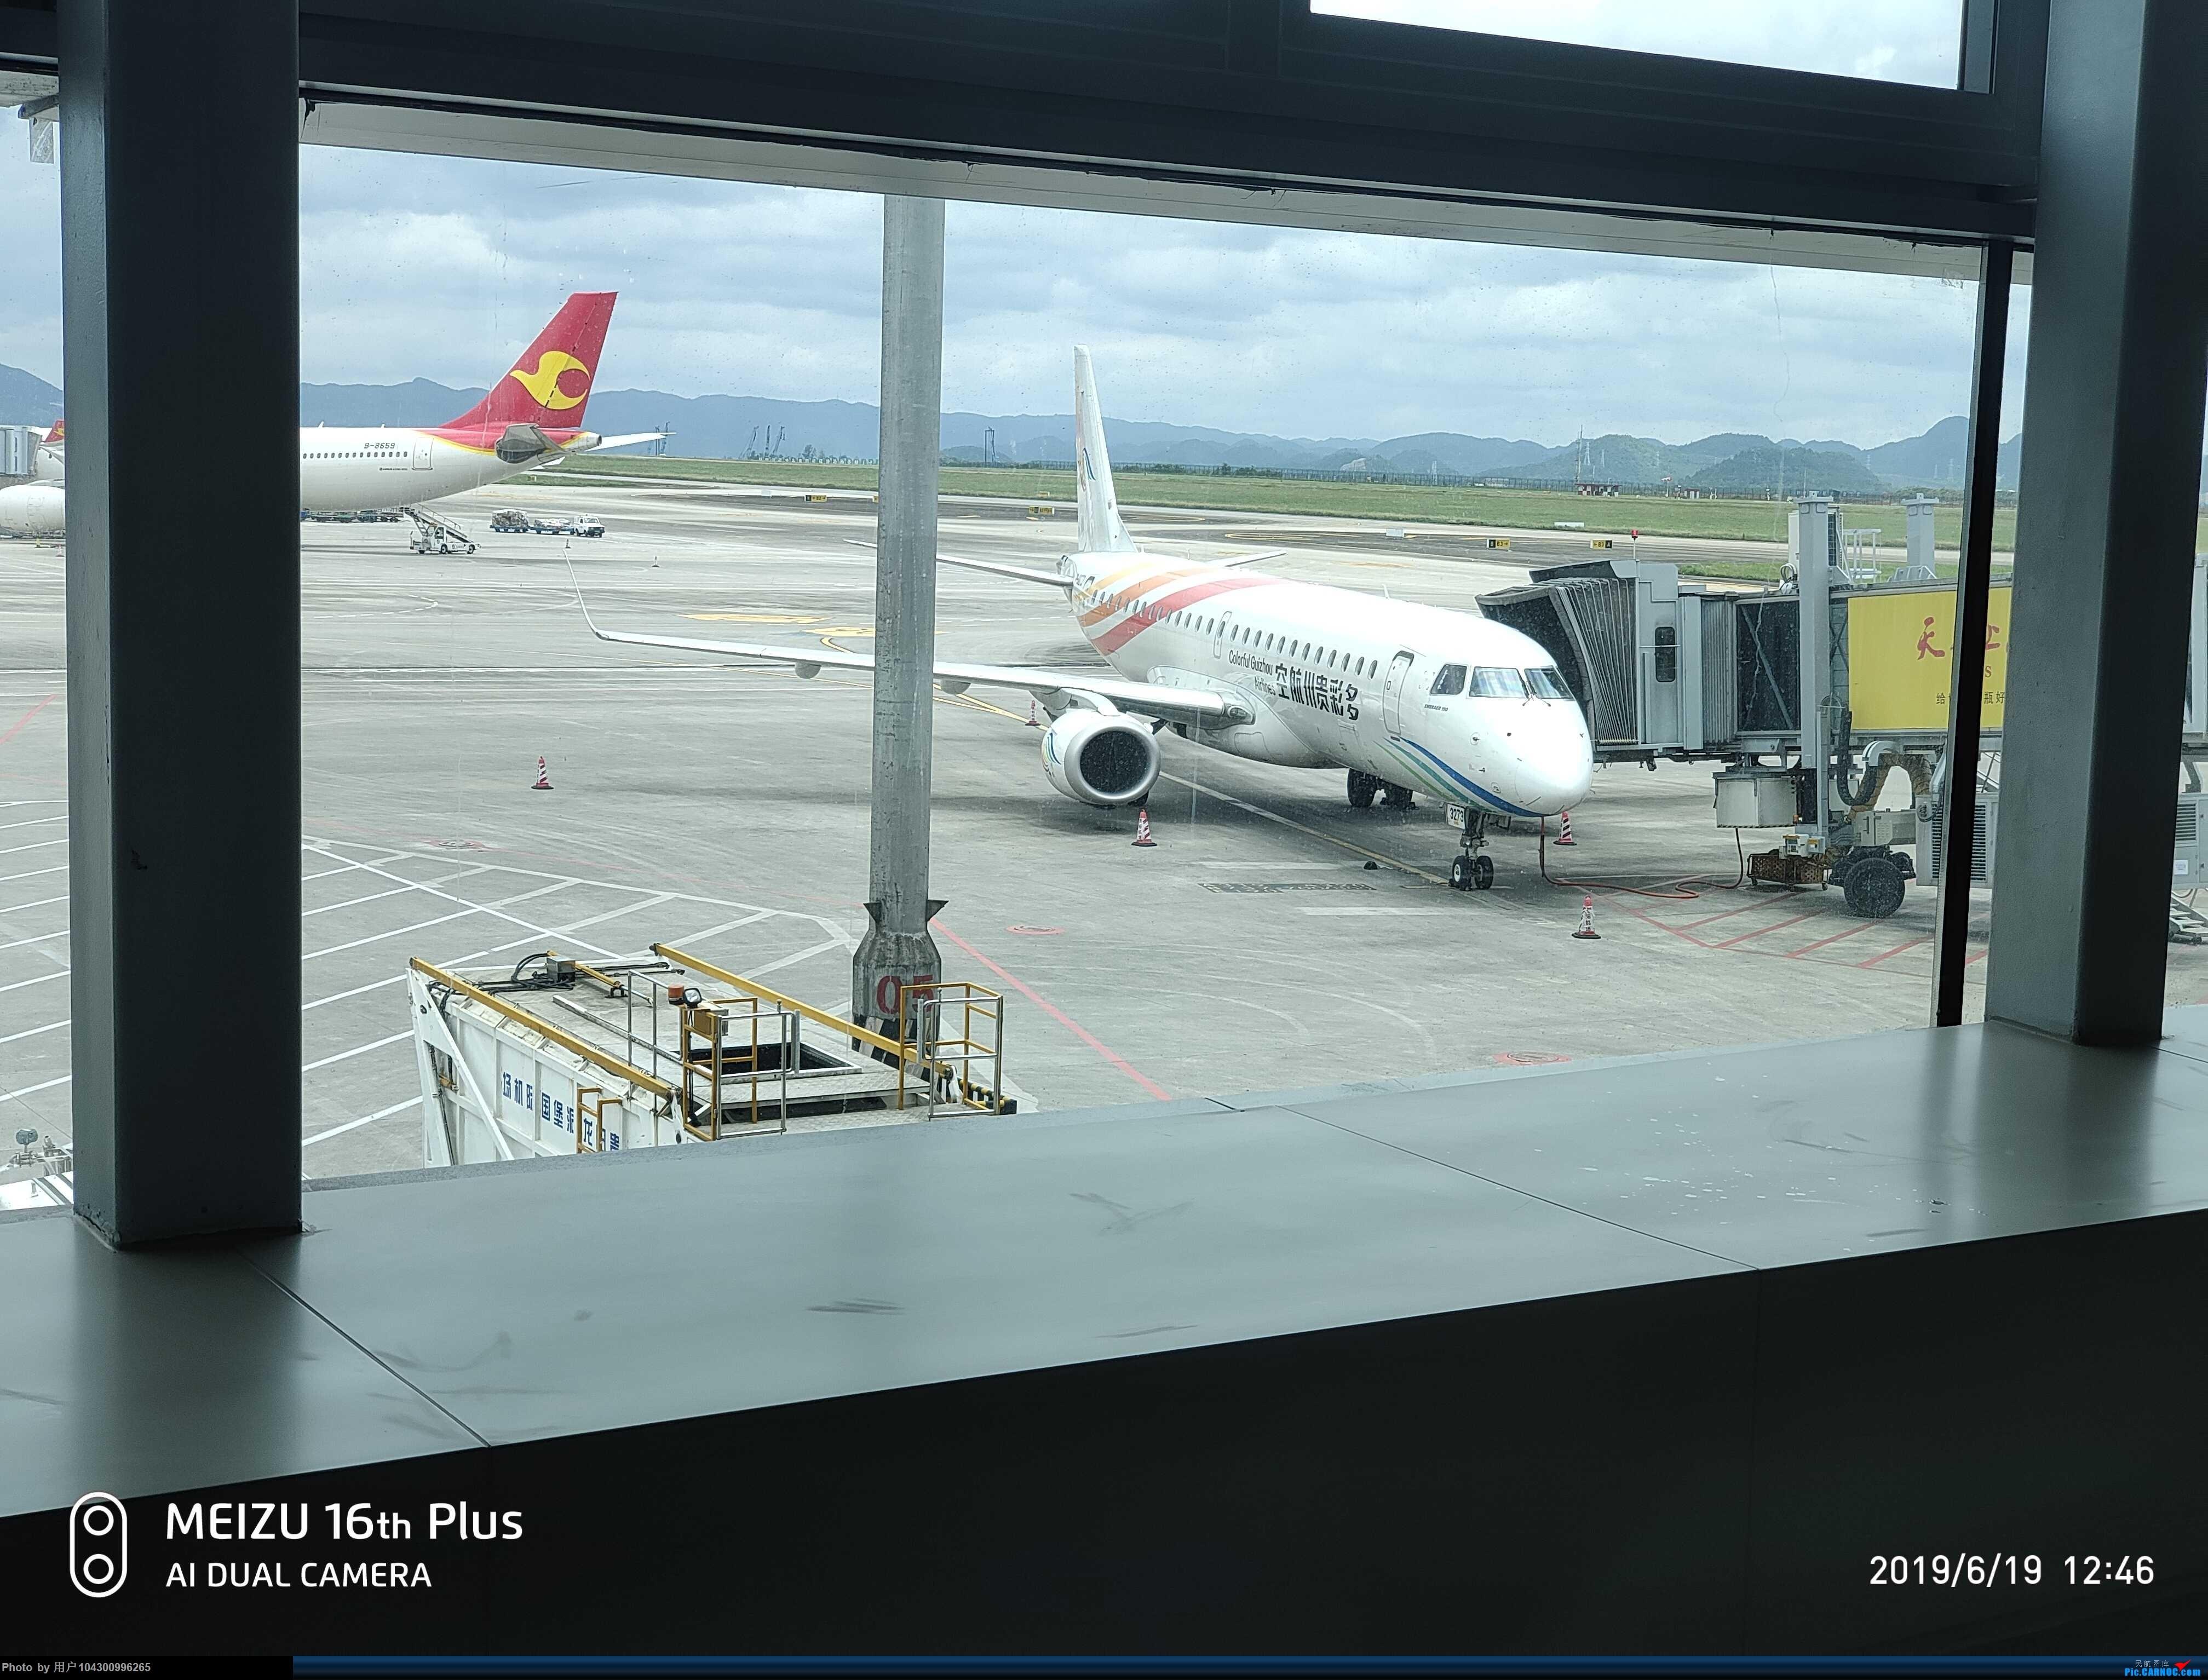 Re:[原创]DM哥飞行游记--贵阳往返荔波2日游 EMBRAER E-190 B-3273 中国贵阳龙洞堡国际机场